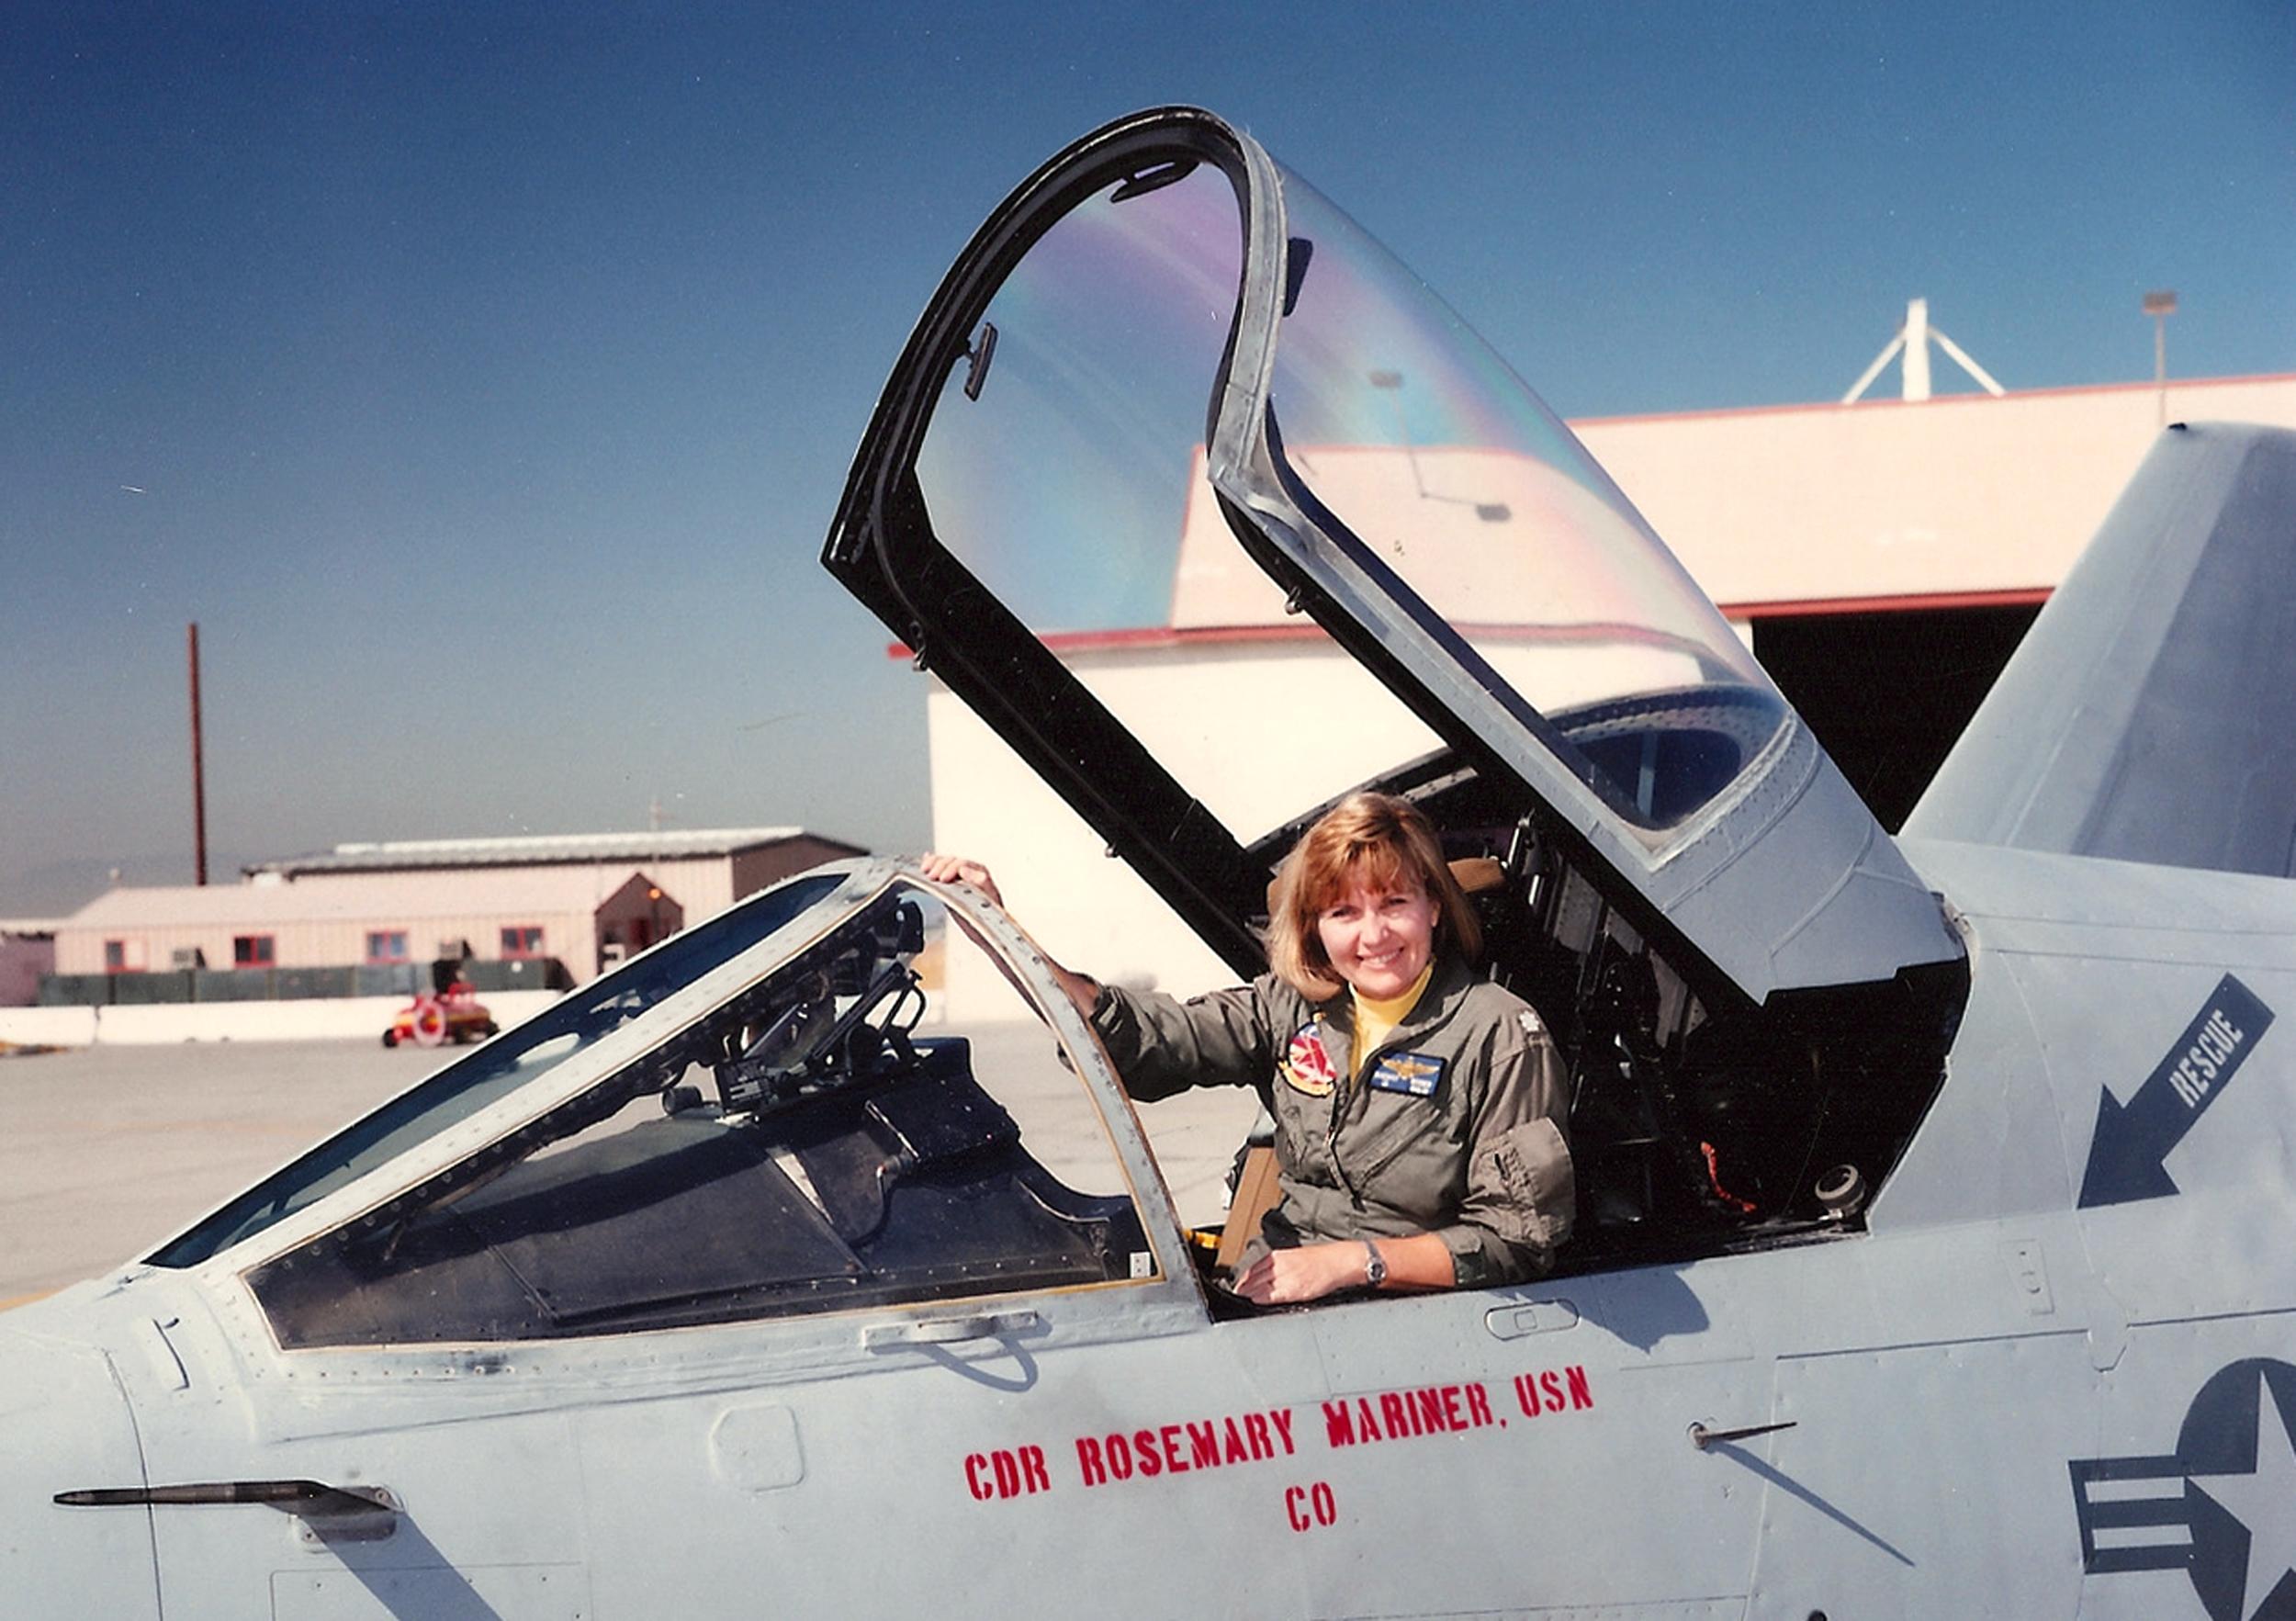 'A Badass Pilot': Capt. Rosemary Mariner, First Woman To